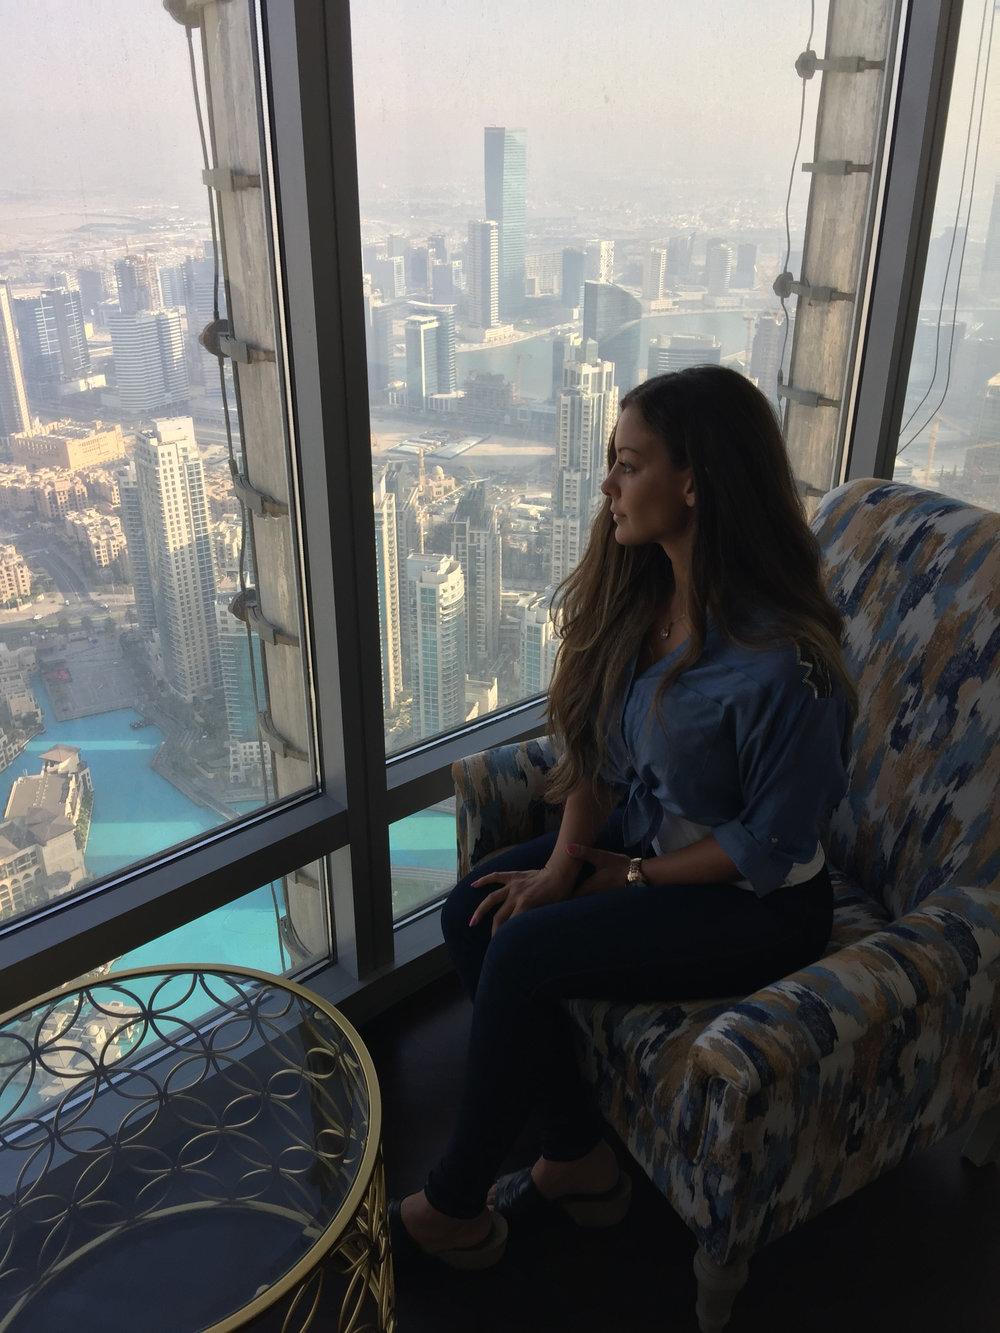 visiting ferrari dubai burj khalifa room travel blogger influencer vlogger carla maria bruno advantures.jpg